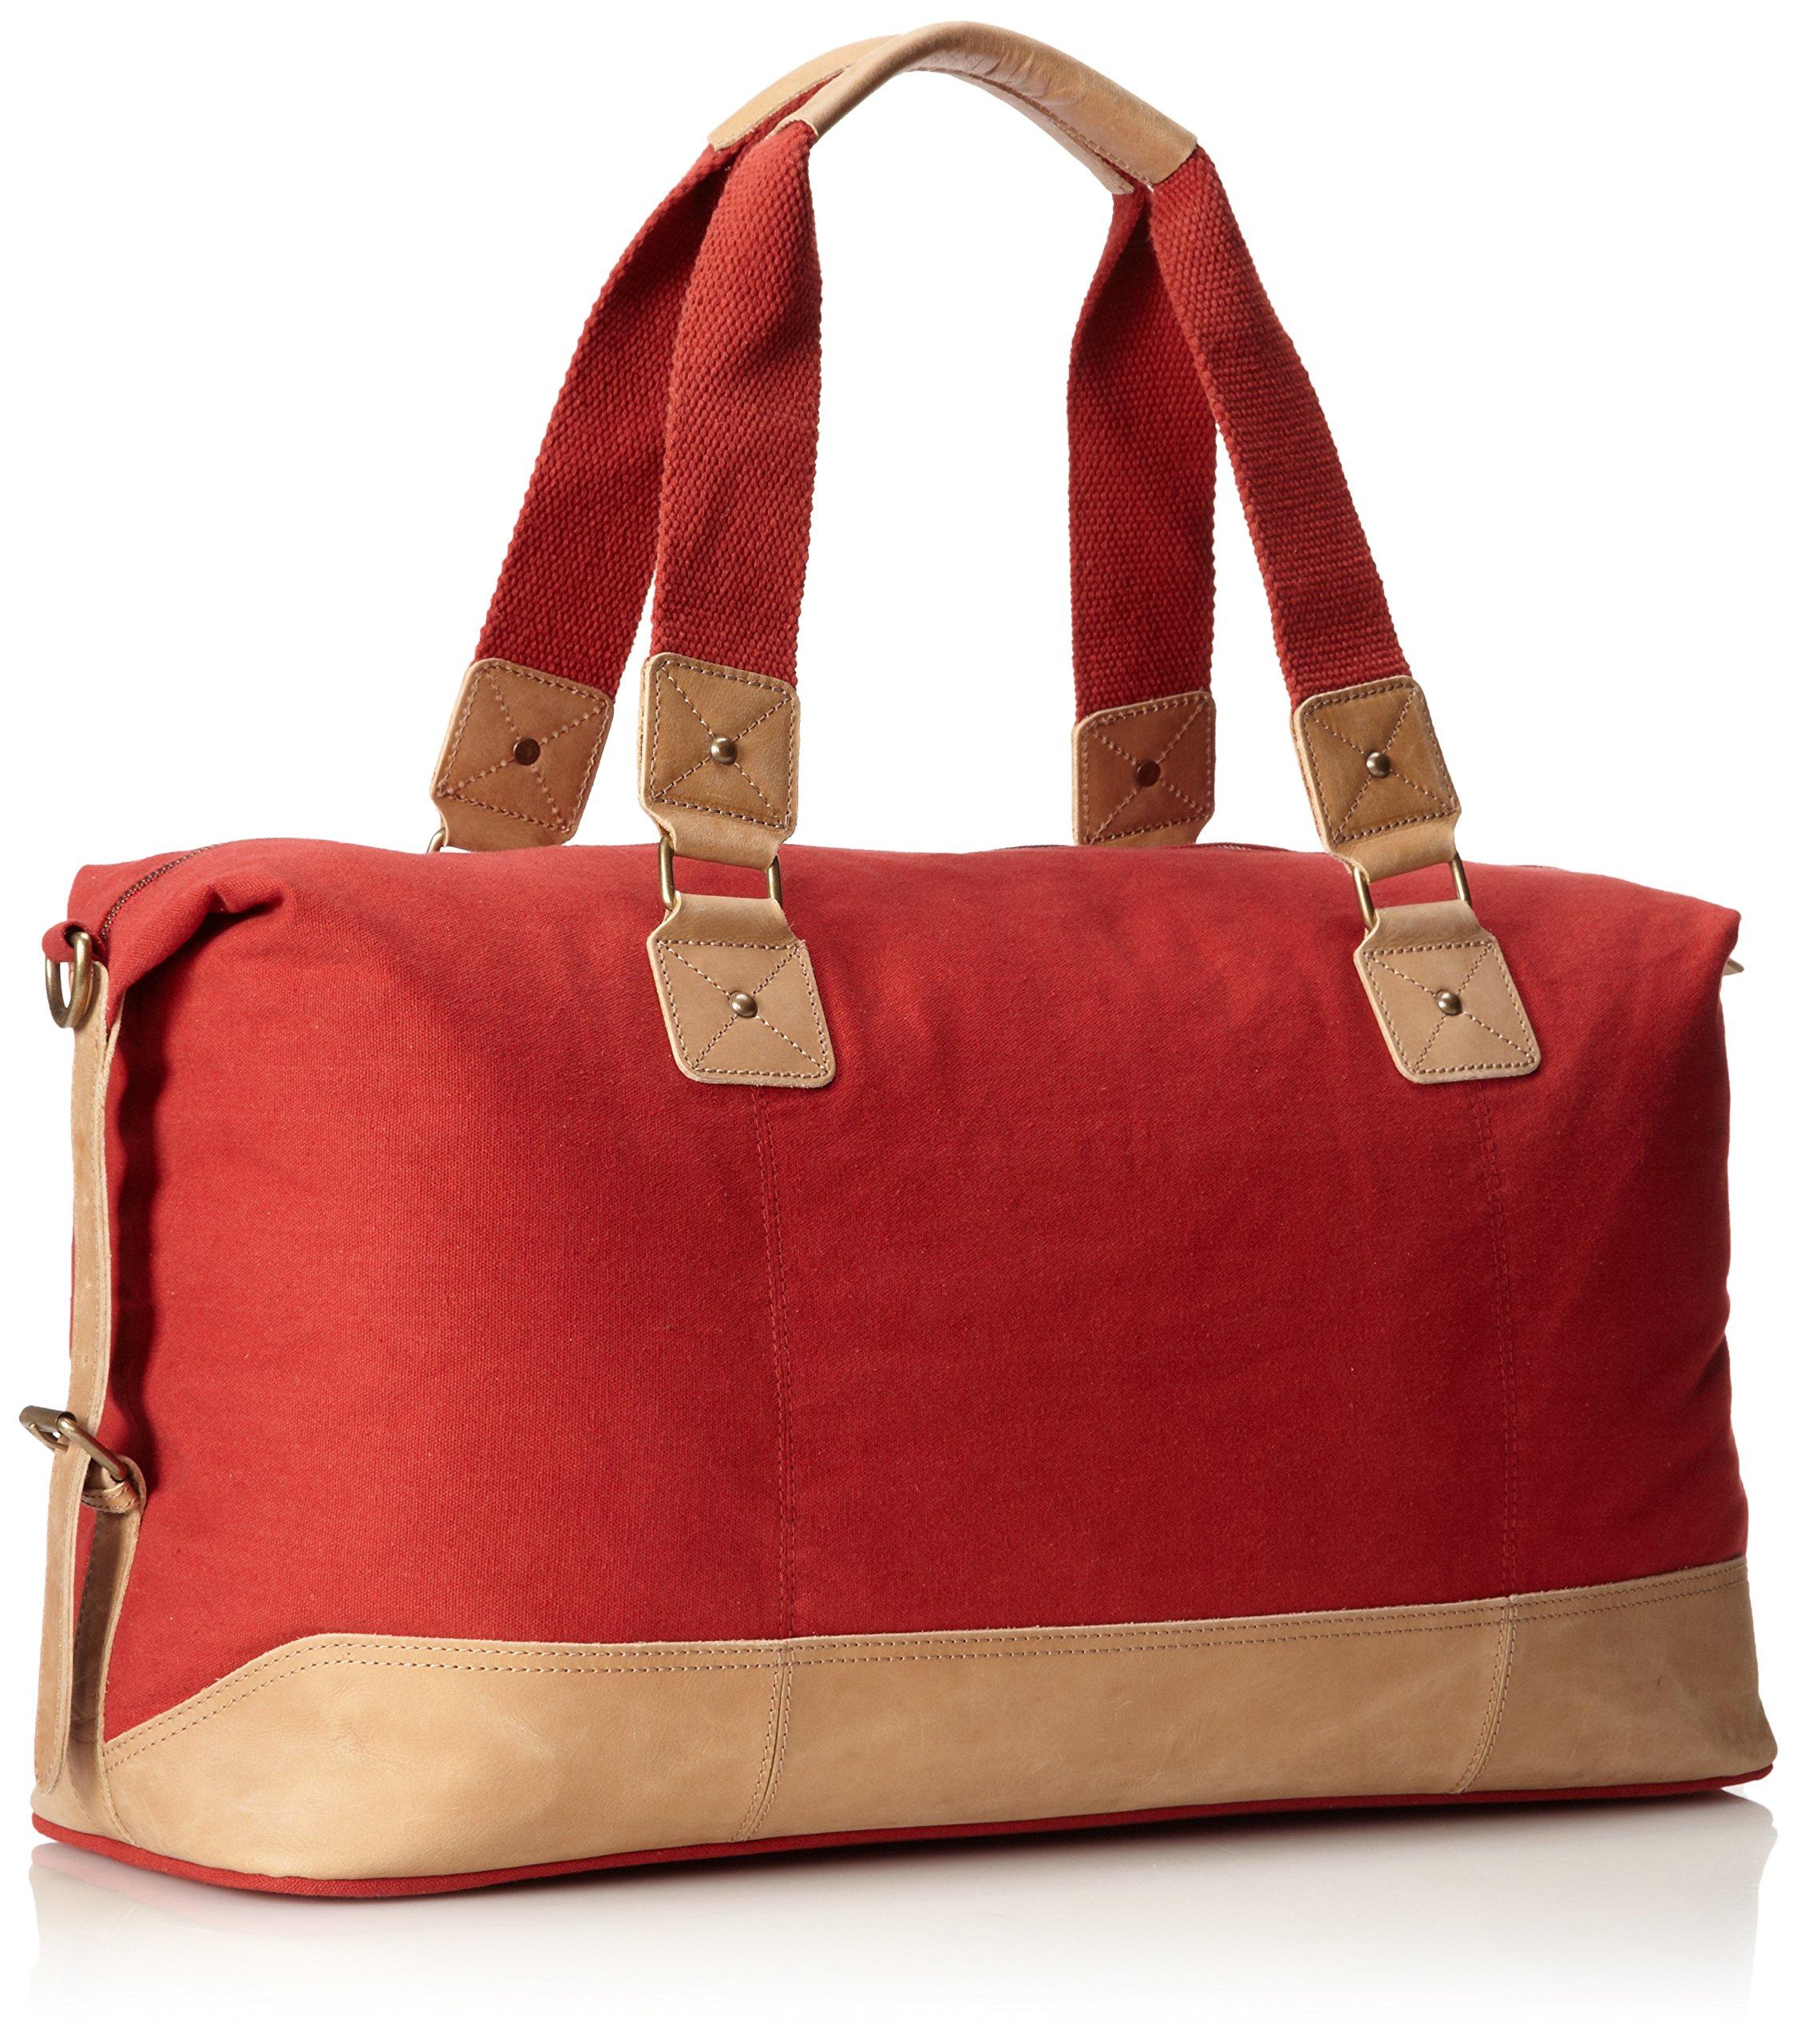 Original Penguin Men's Canvas Weekend Bag Duffel Bag, Pompeian Red, One Size by Original Penguin (Image #2)